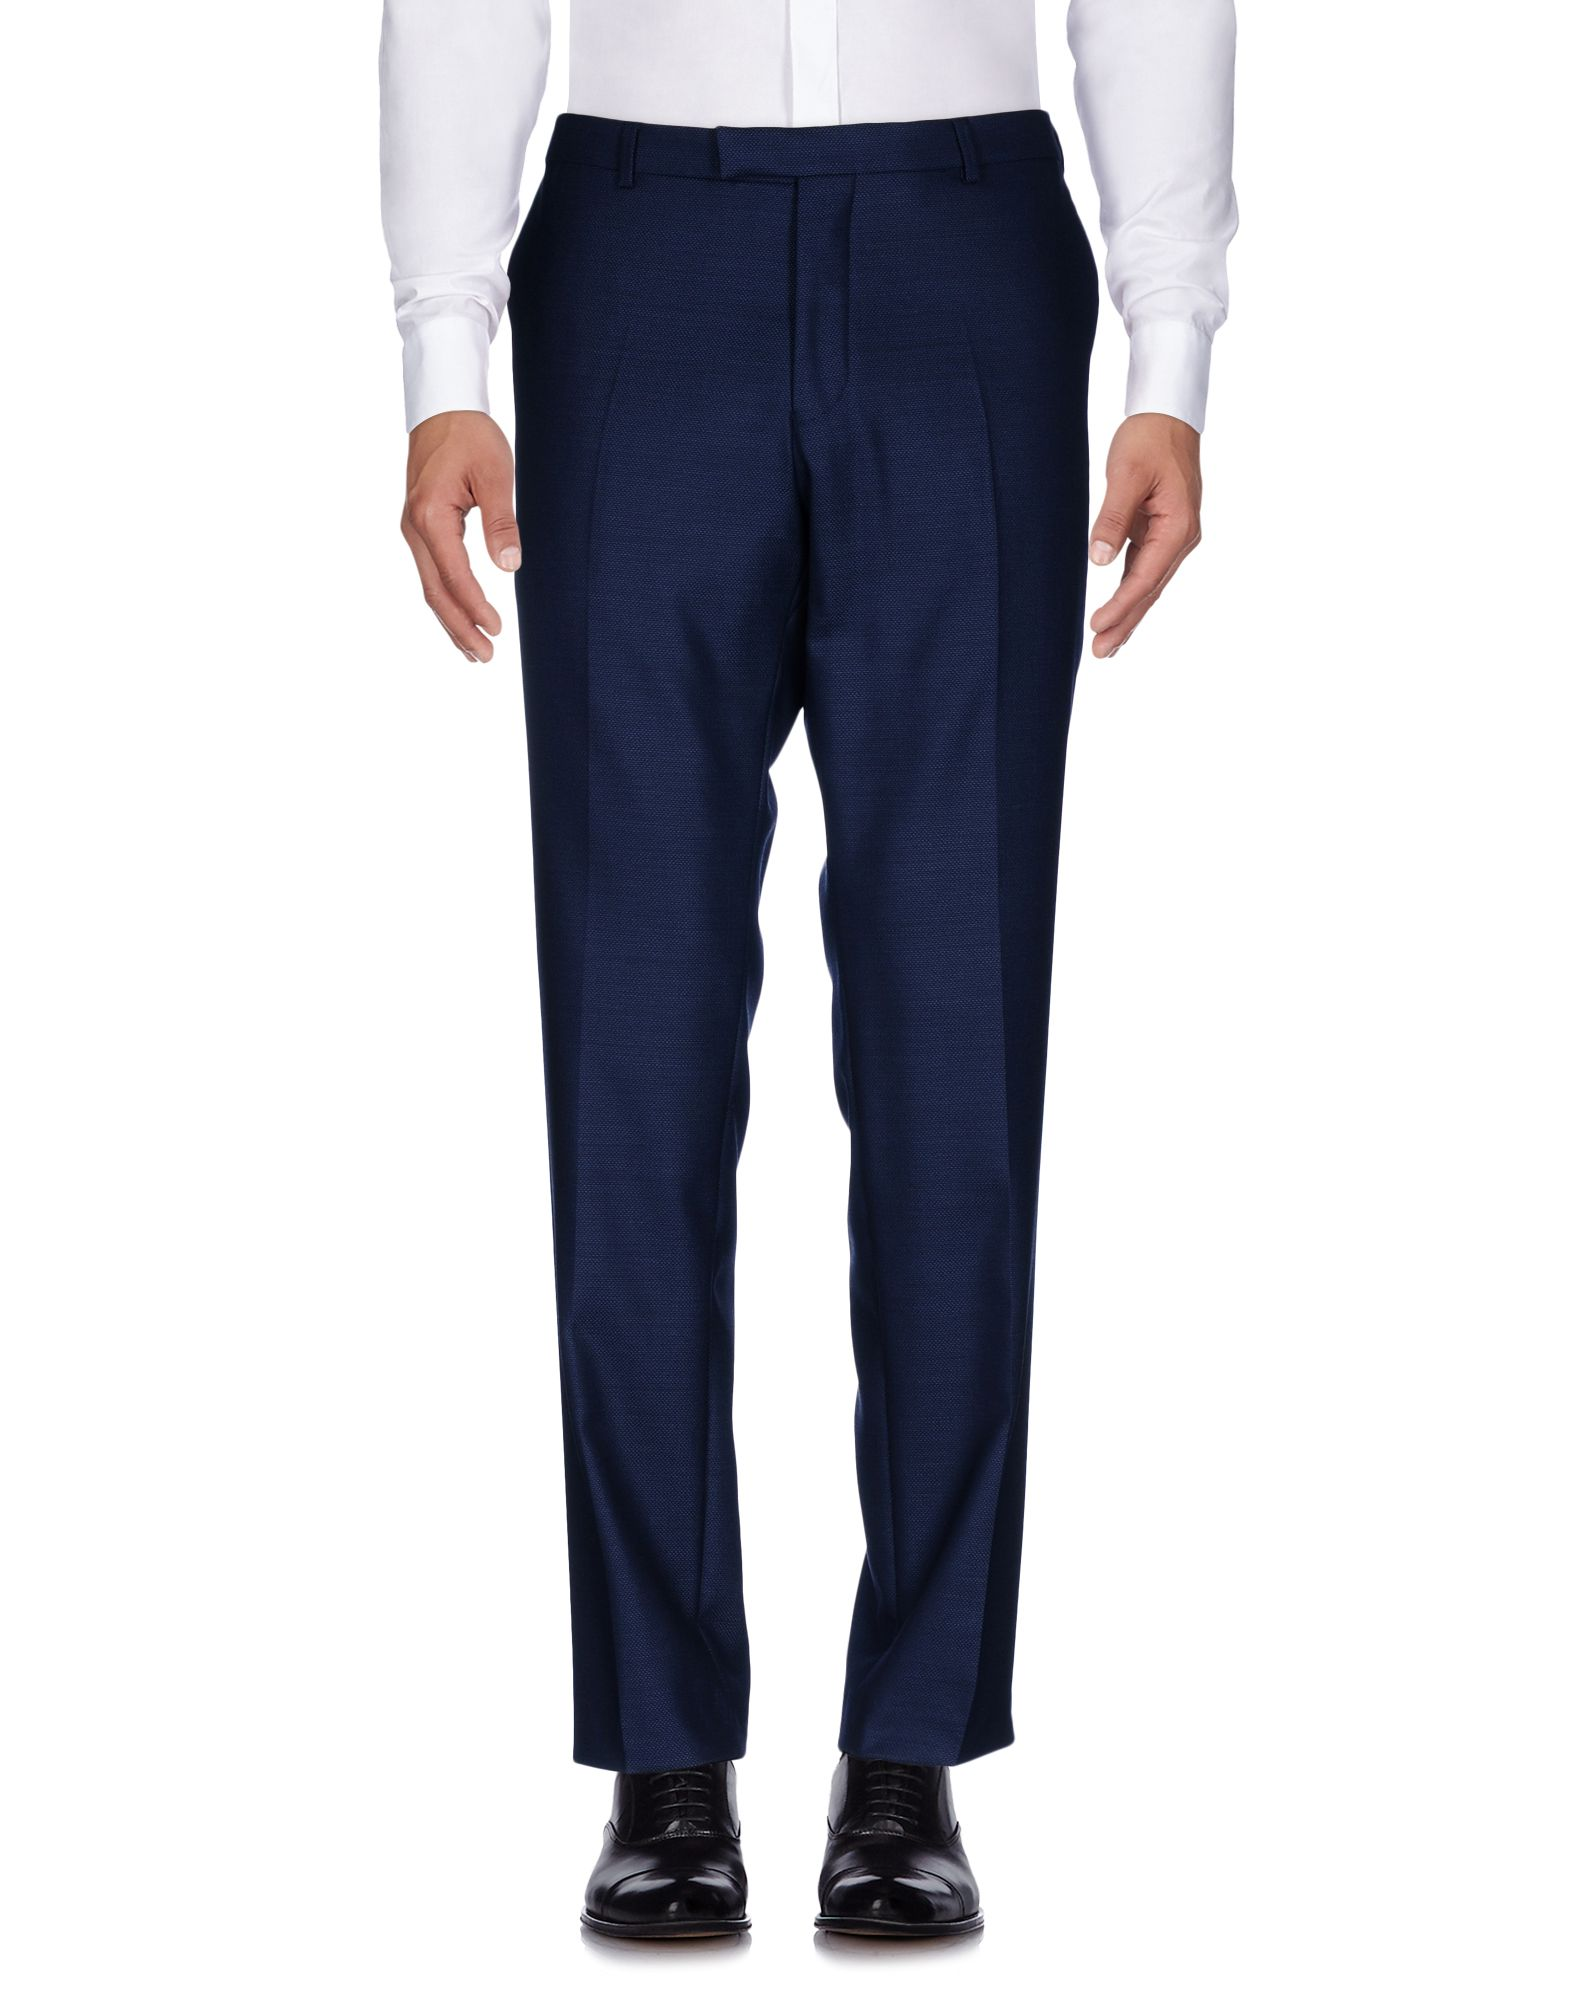 OSCAR JACOBSON Casual Pants in Dark Blue